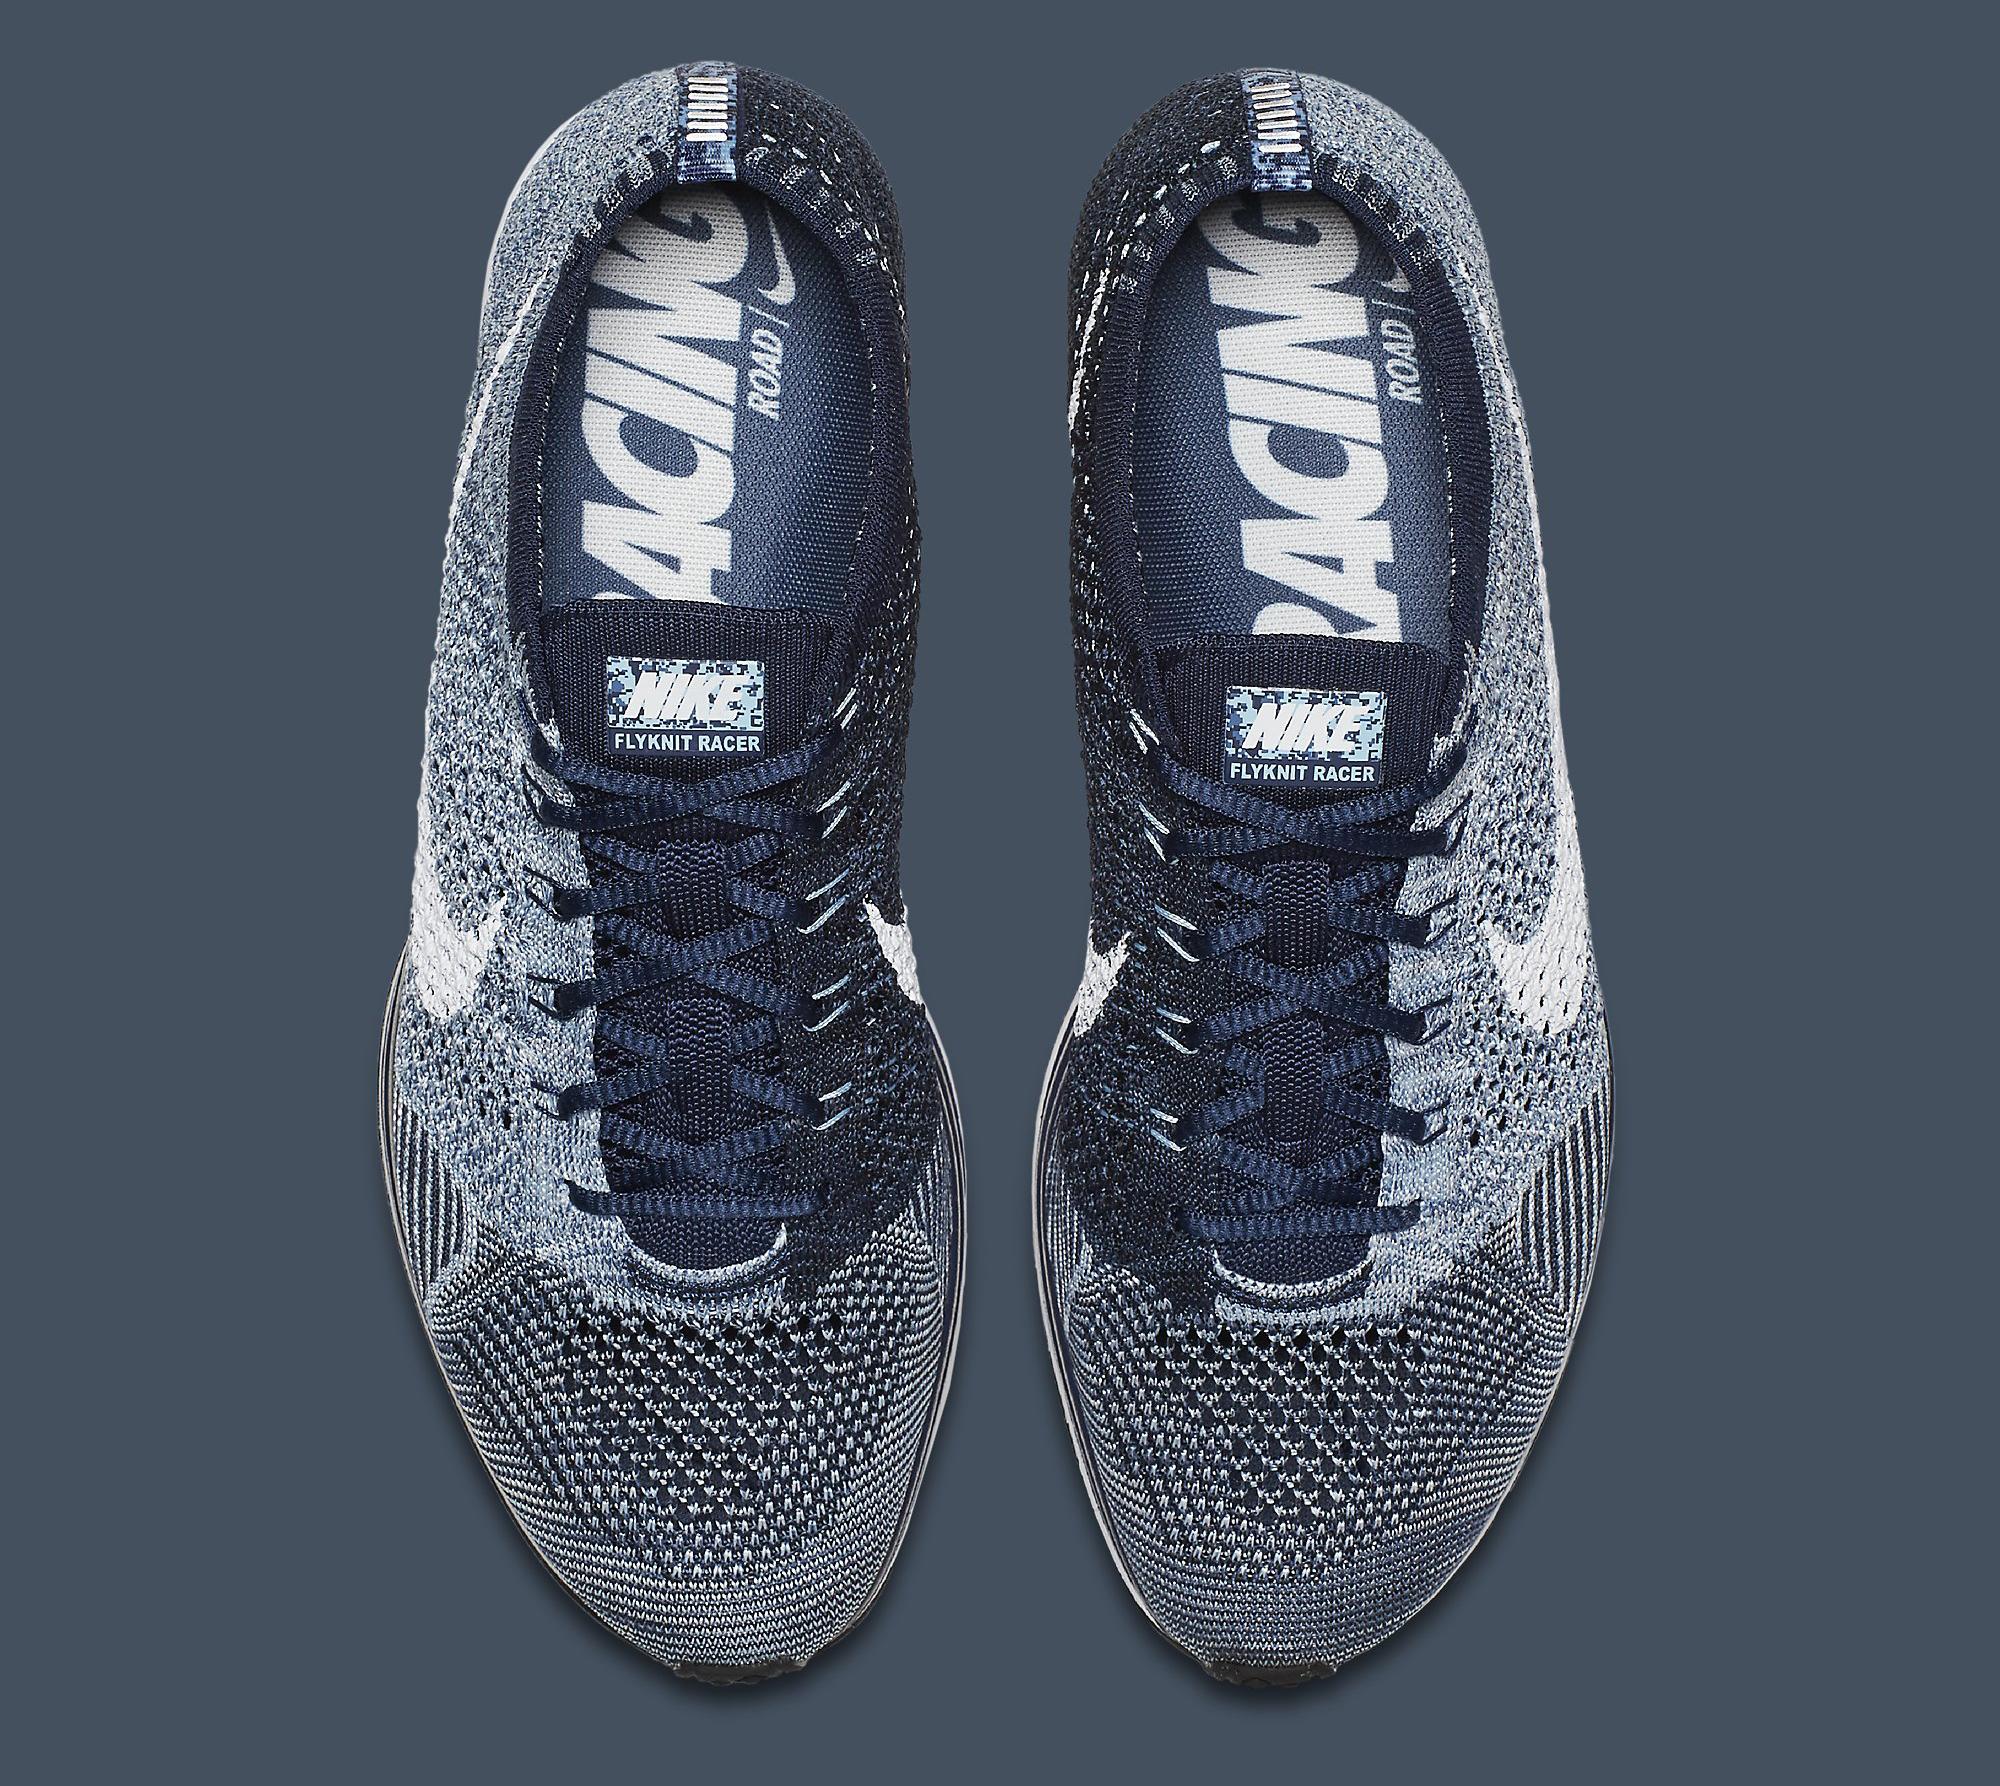 info for 47c03 4994b Image via Nike Nike Flyknit Racer Blue Tint White 862713-401 Top